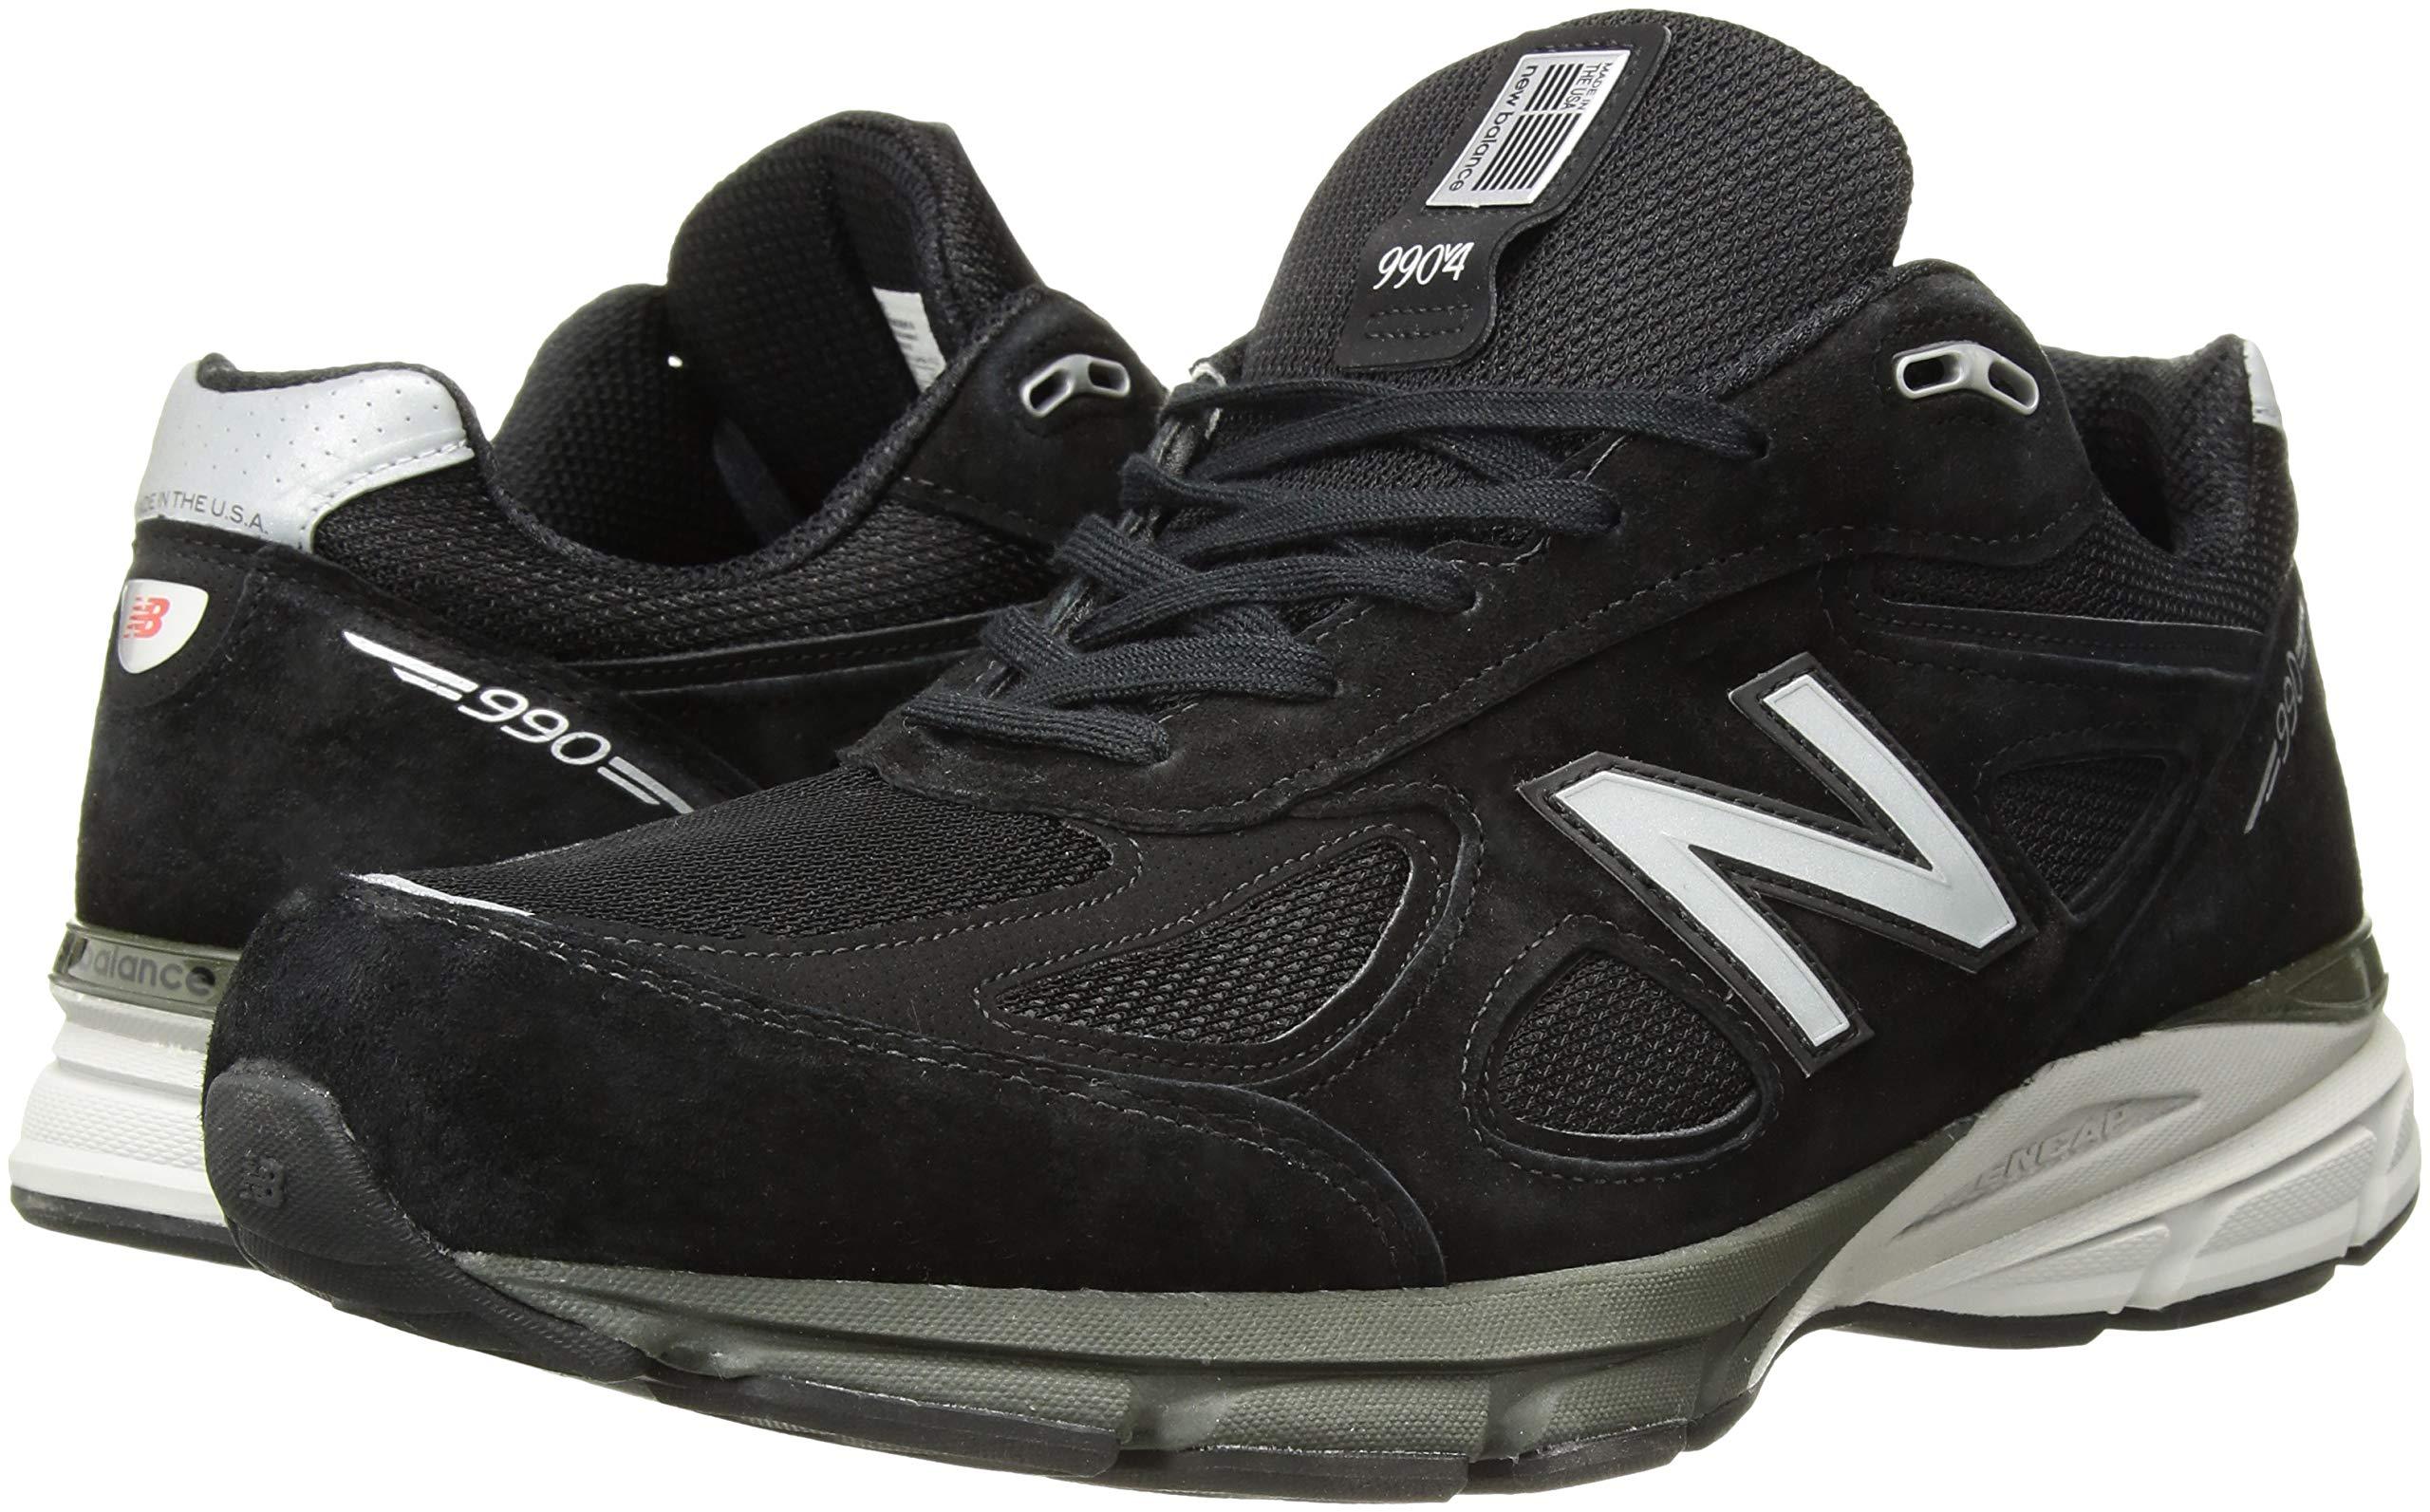 810dzz2g54L - New Balance Mens M990 990v4 Black Size: 7.5 Wide